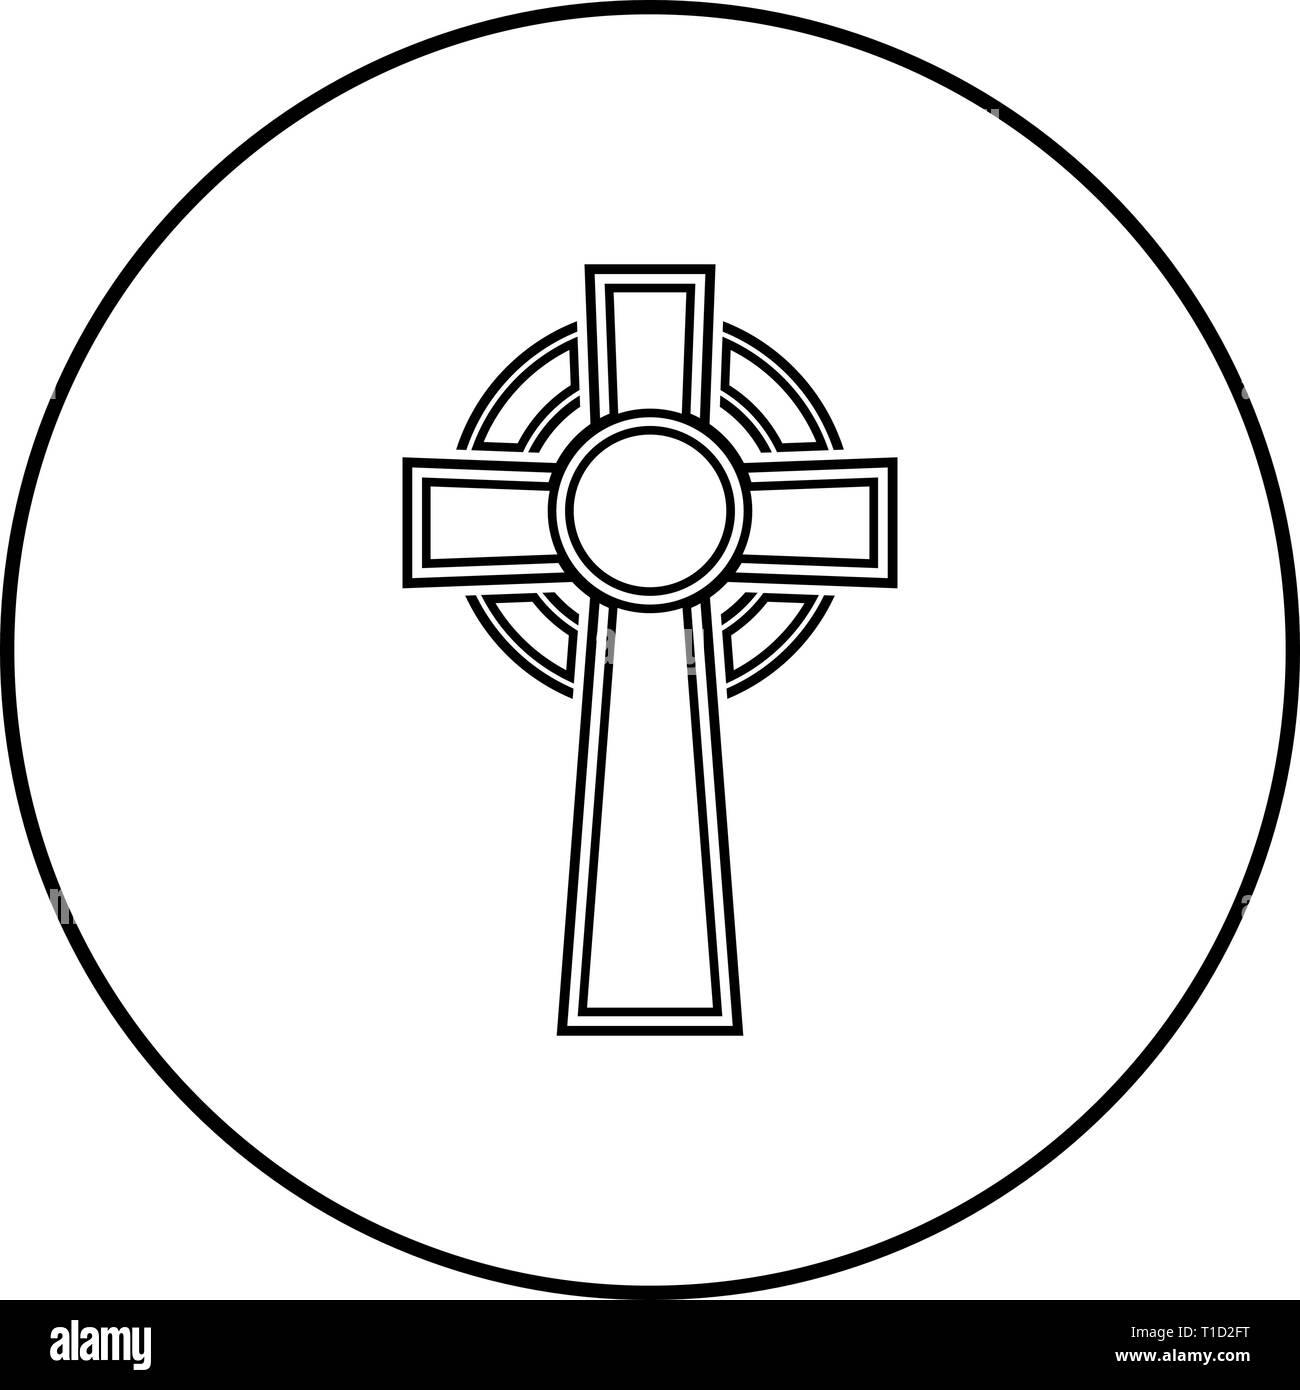 celtic cross icon outline